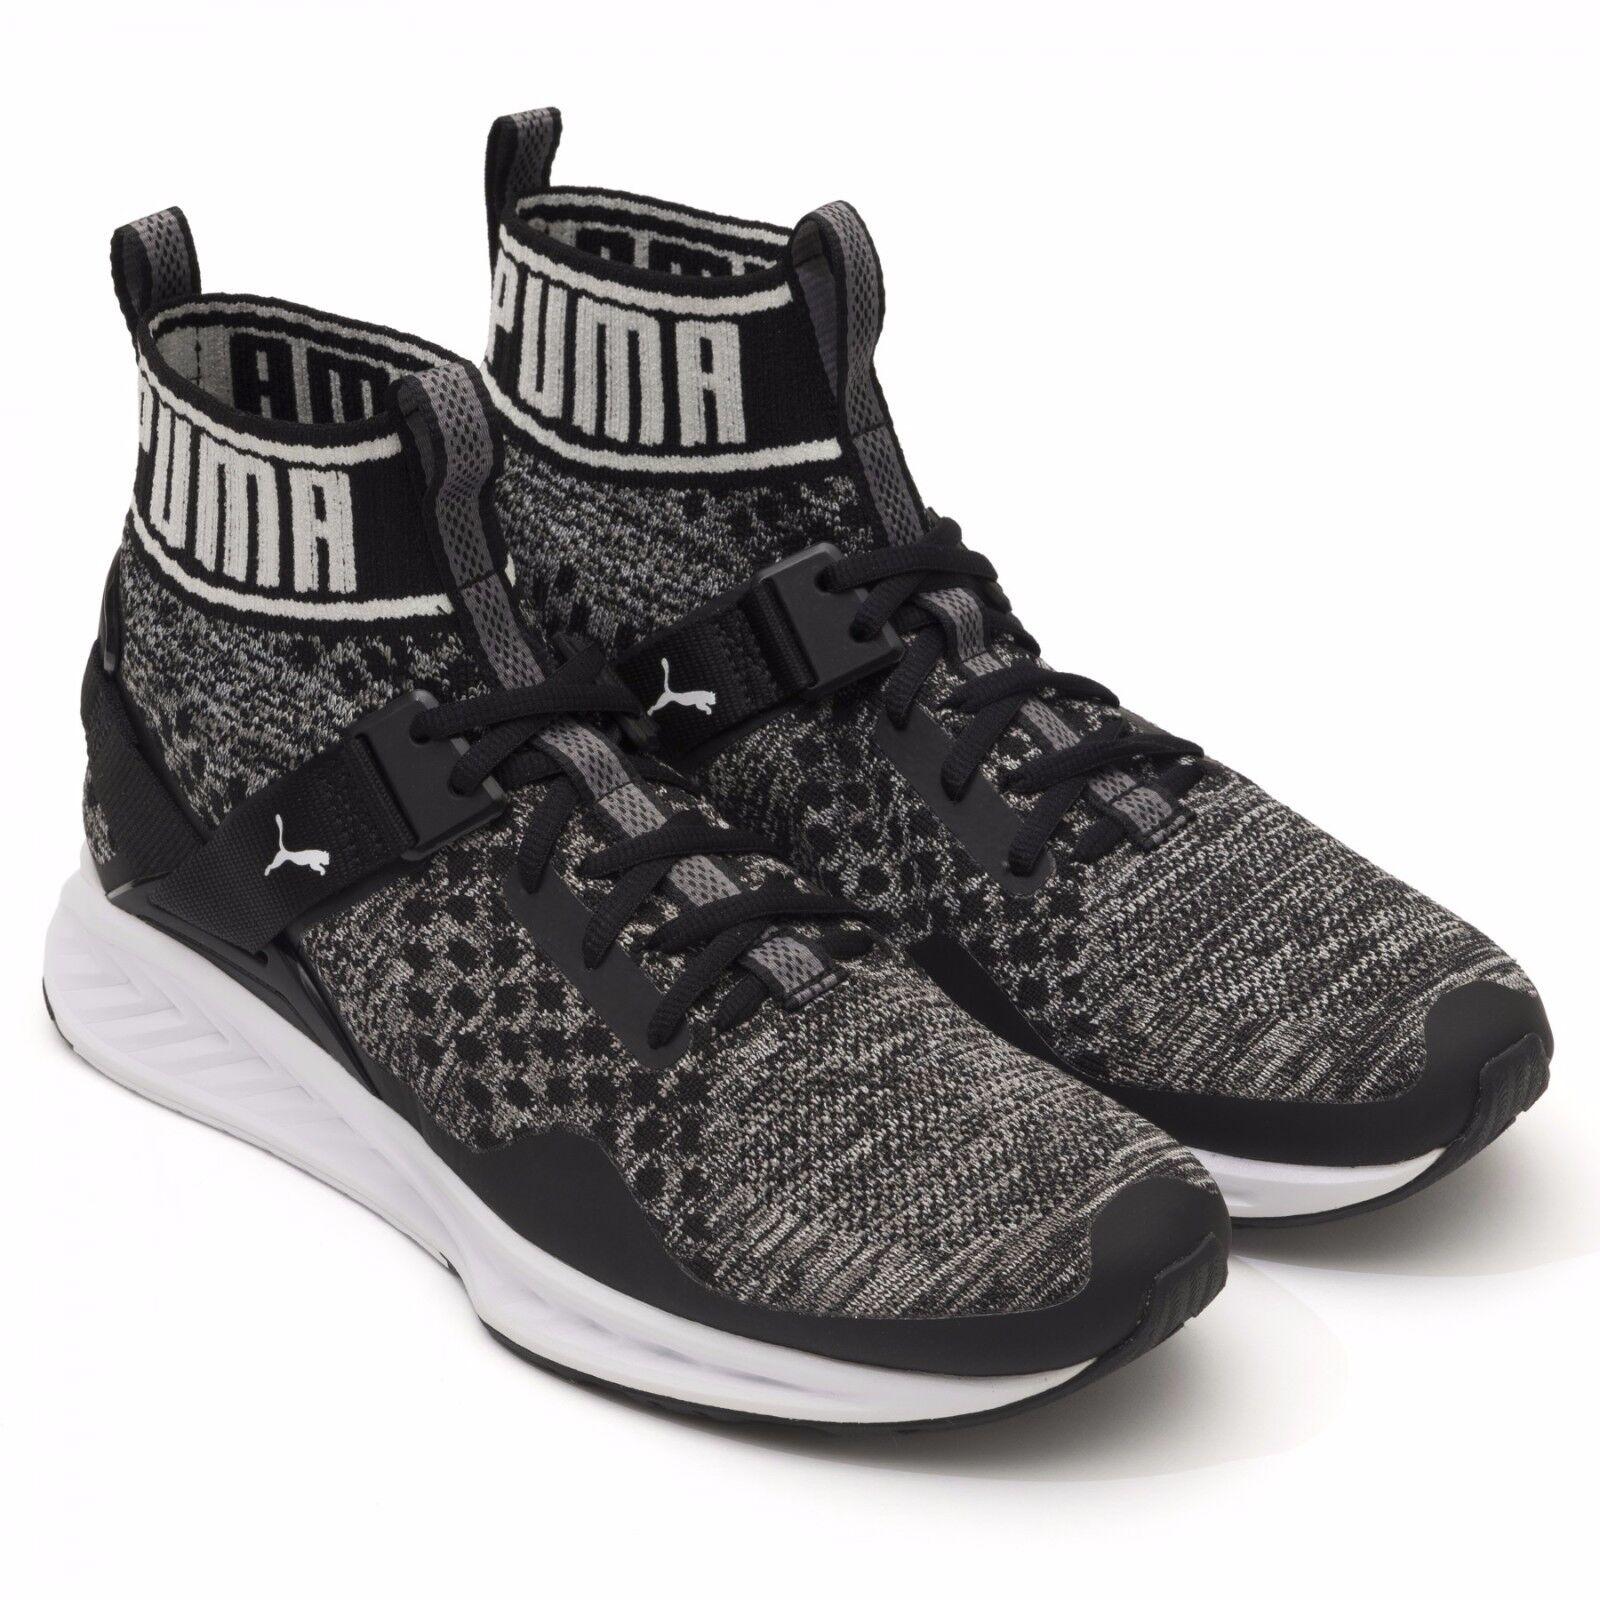 Puma Ignite Evoknit 189697-01 Knit High performance shoes Men